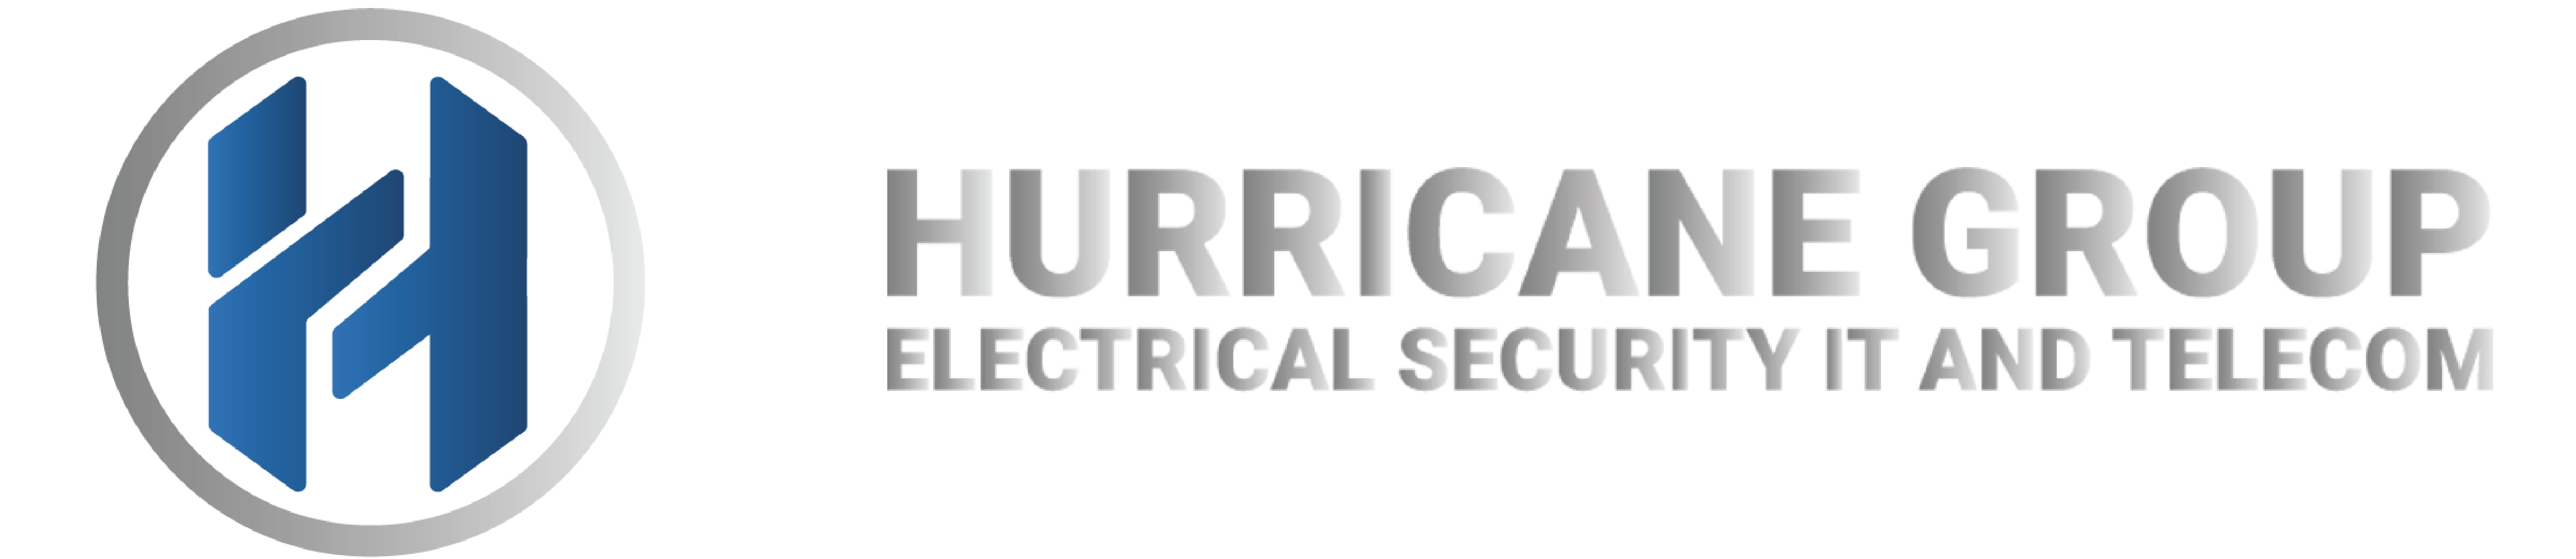 Hurricane Group